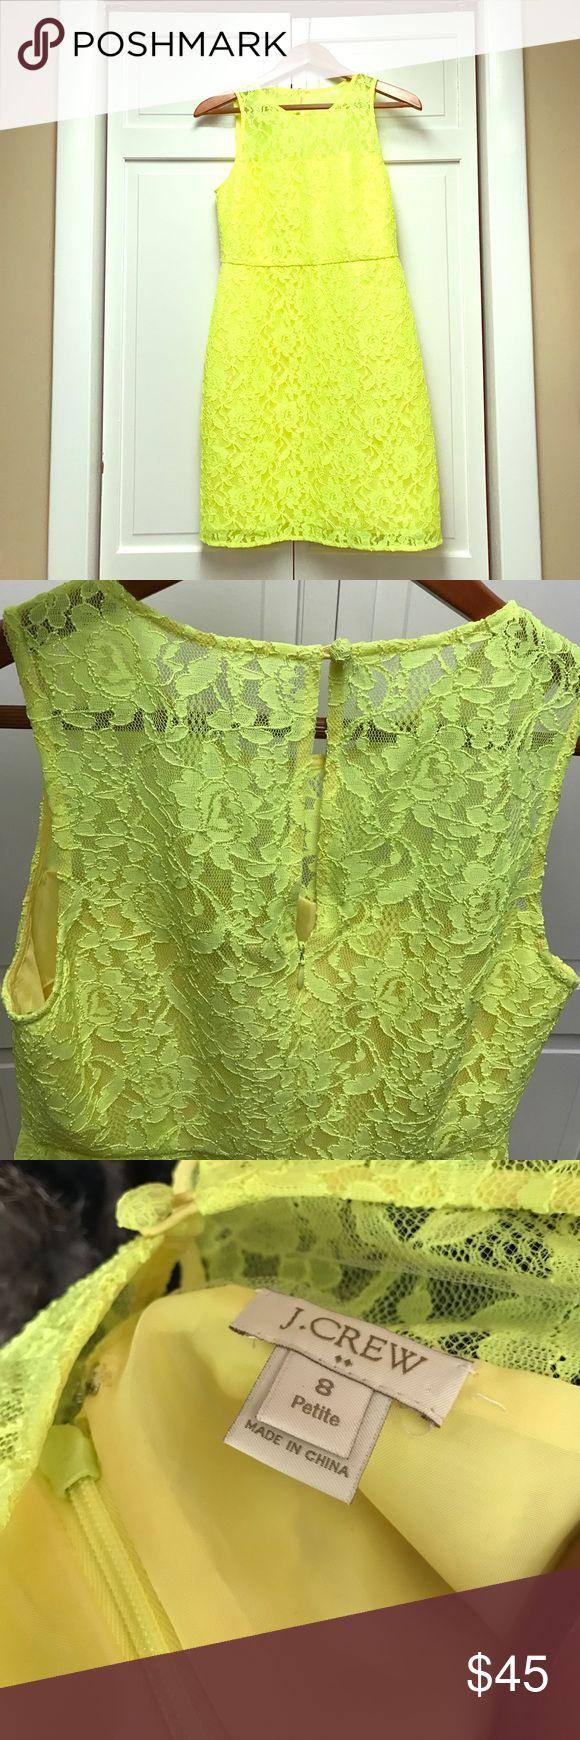 NWOT J.Crew Neon Yellow Lace Dress Sz 8 Never been worn / j.crew / Neon Yellow / lace dress / lined / sheer lace chest / back zip closure with button top closure J. Crew Dresses